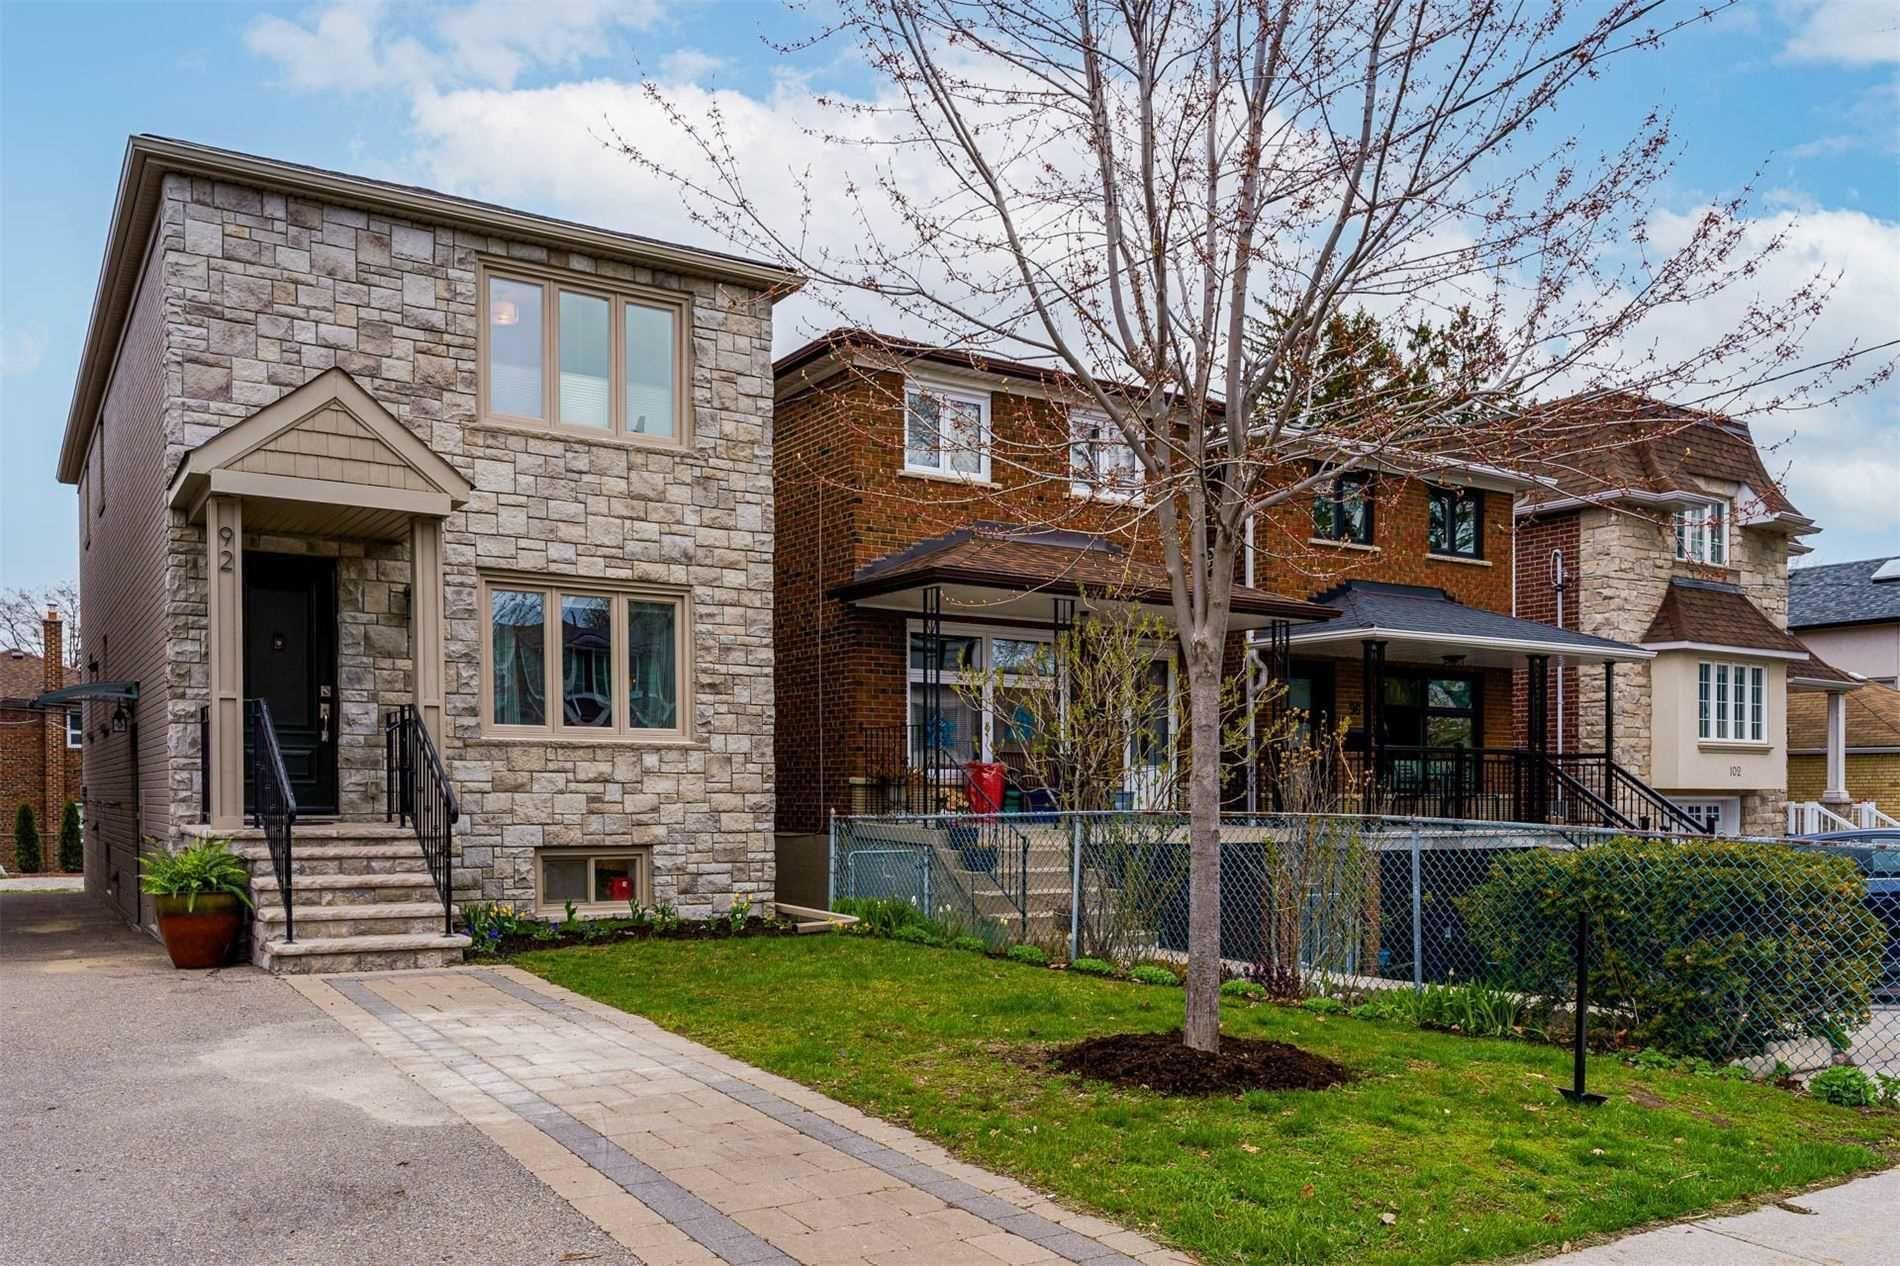 Photo 1: Photos: 92 Holborne Avenue in Toronto: Danforth Village-East York House (2-Storey) for sale (Toronto E03)  : MLS®# E5204452